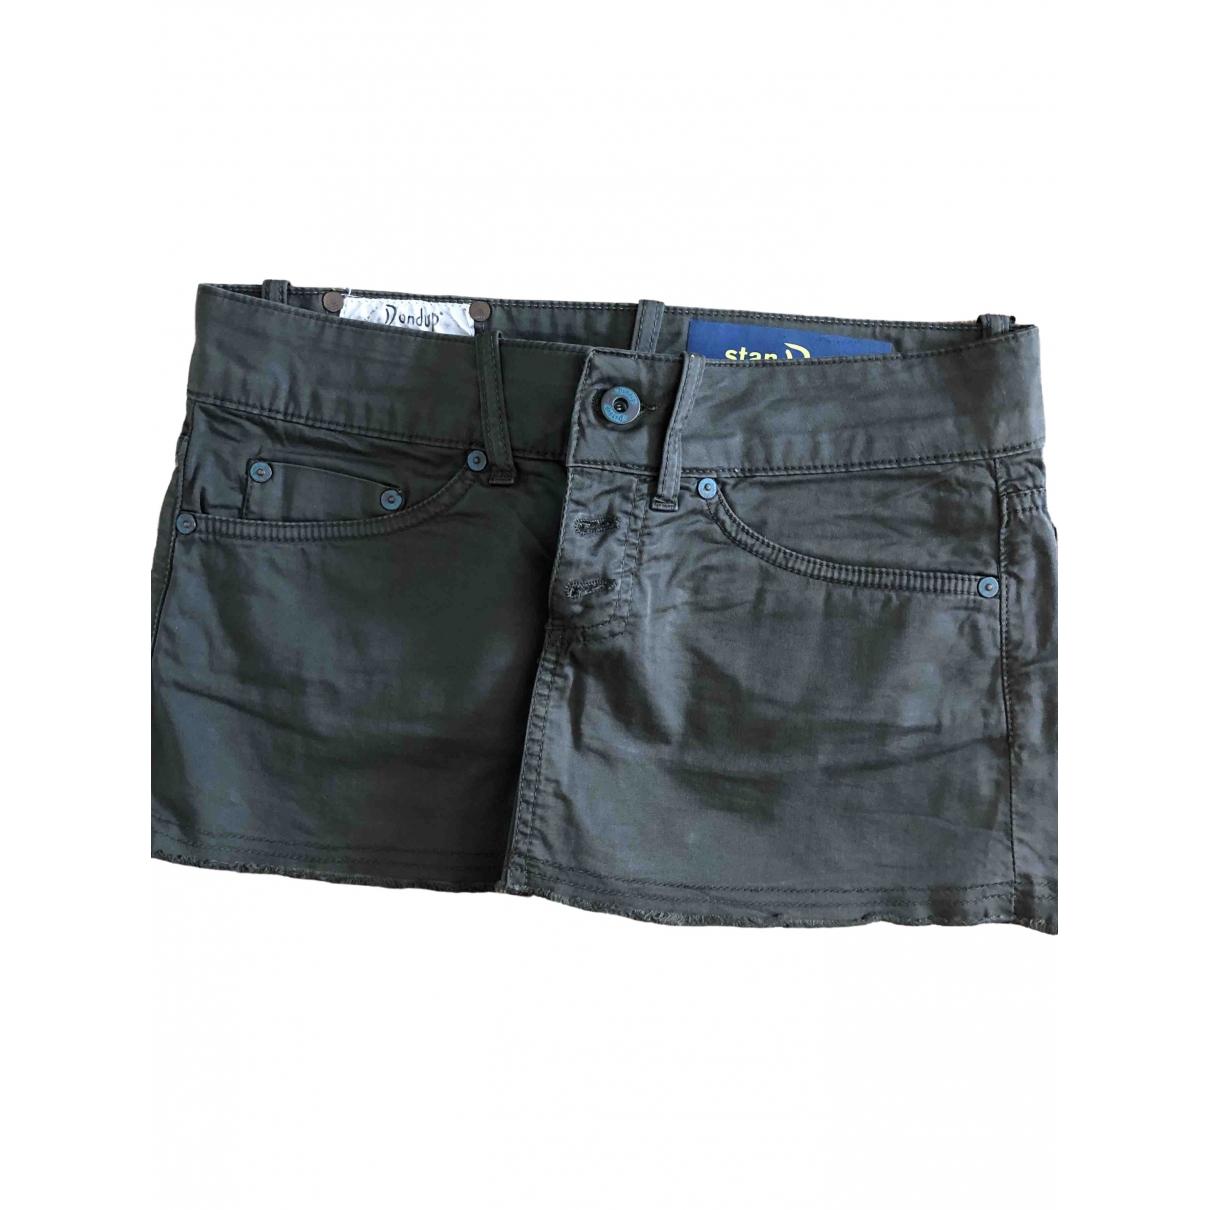 Dondup \N Khaki Cotton skirt for Women 38 IT